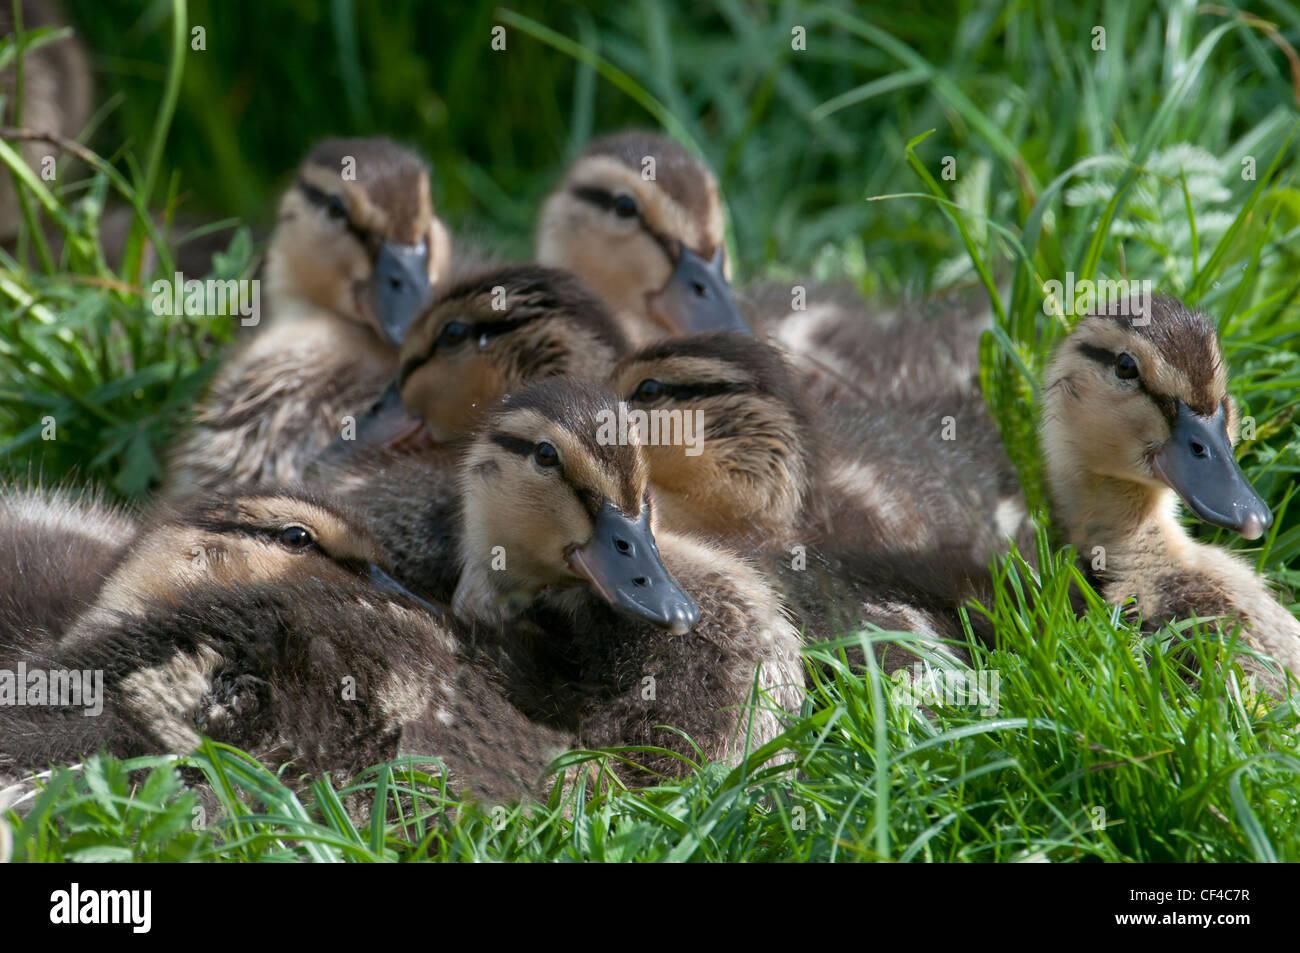 GROUP OF MALLARD DUCKLINGS ANAS PLATYRHYNCHOS RESTING ON GRASS - Stock Image